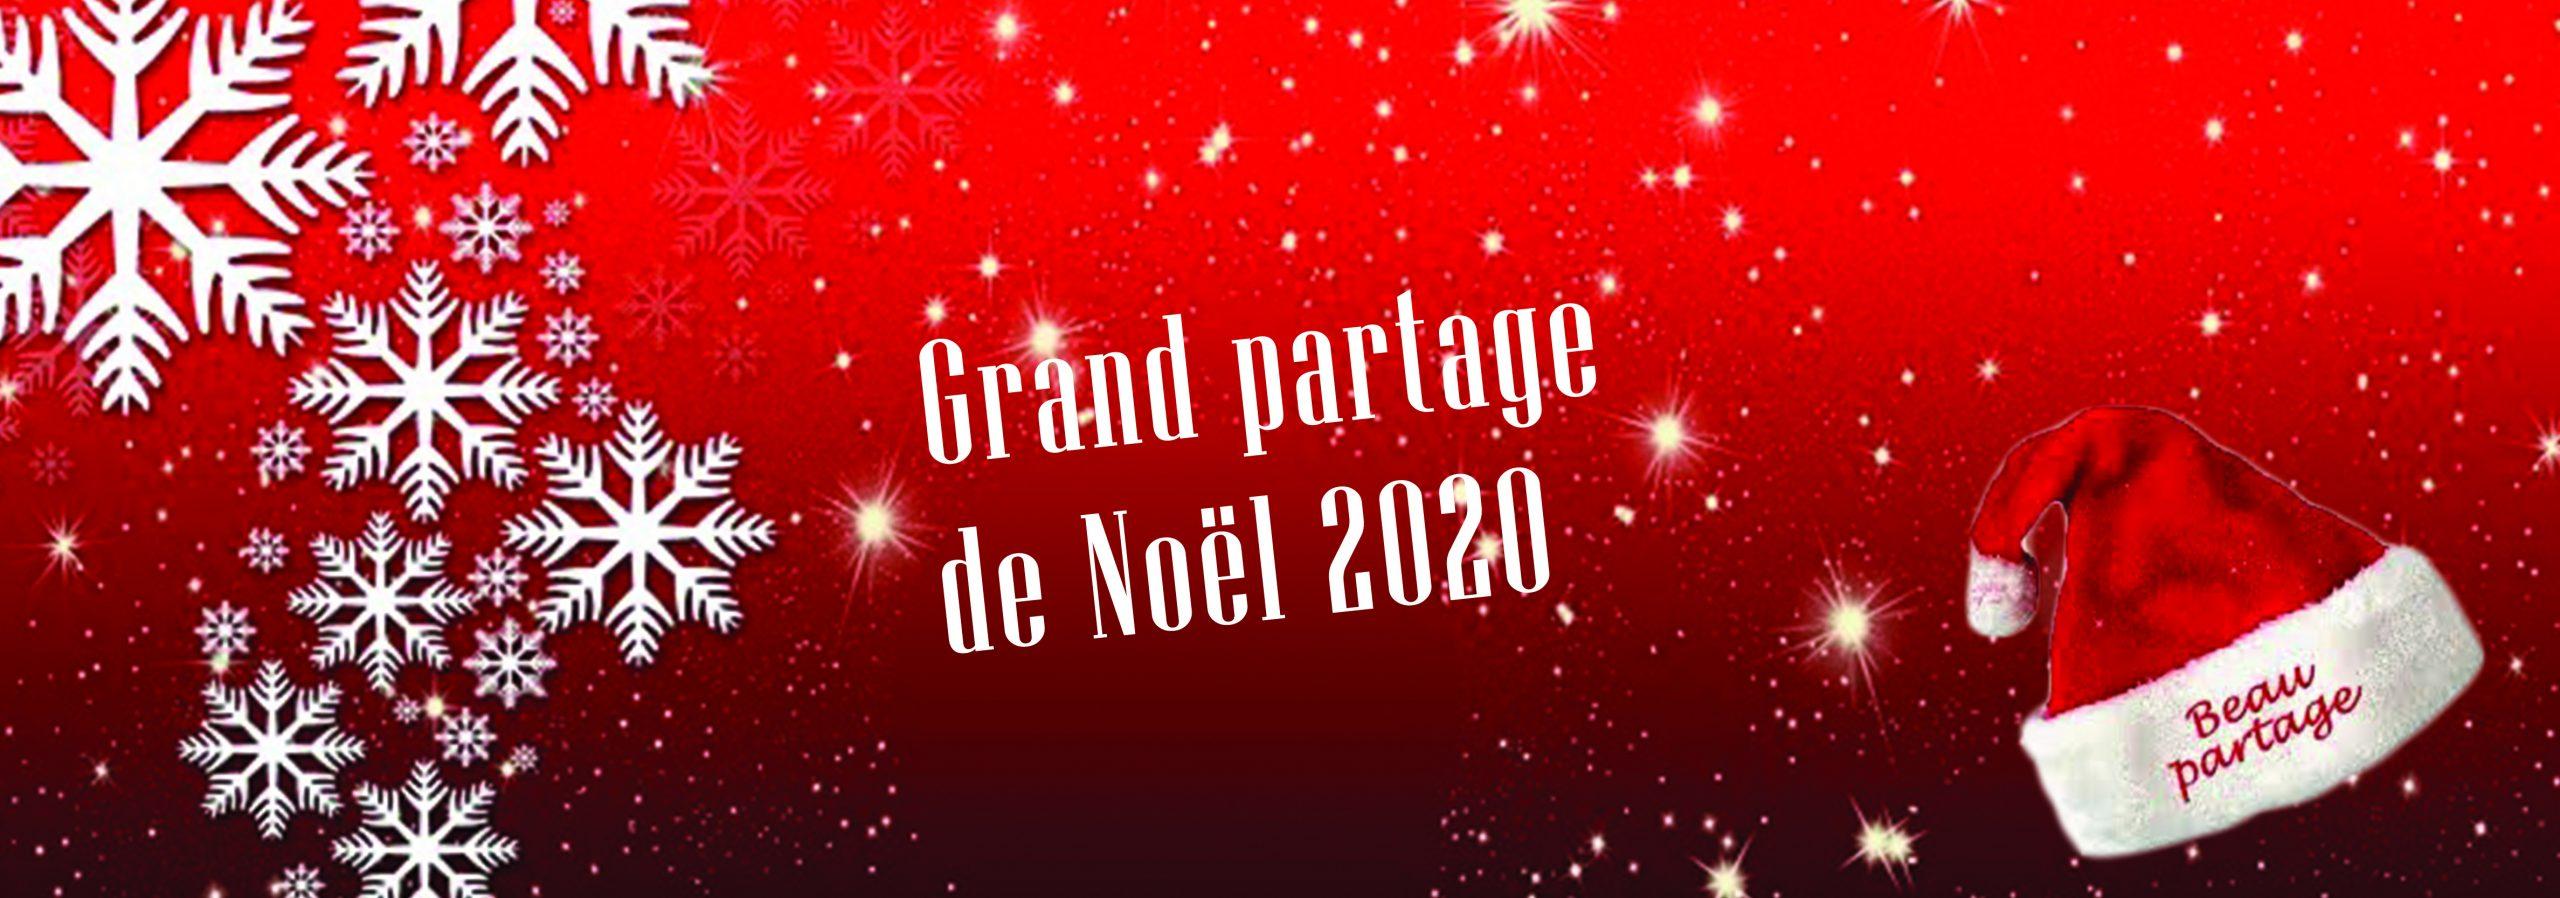 Campagne Partage de Noël 2020